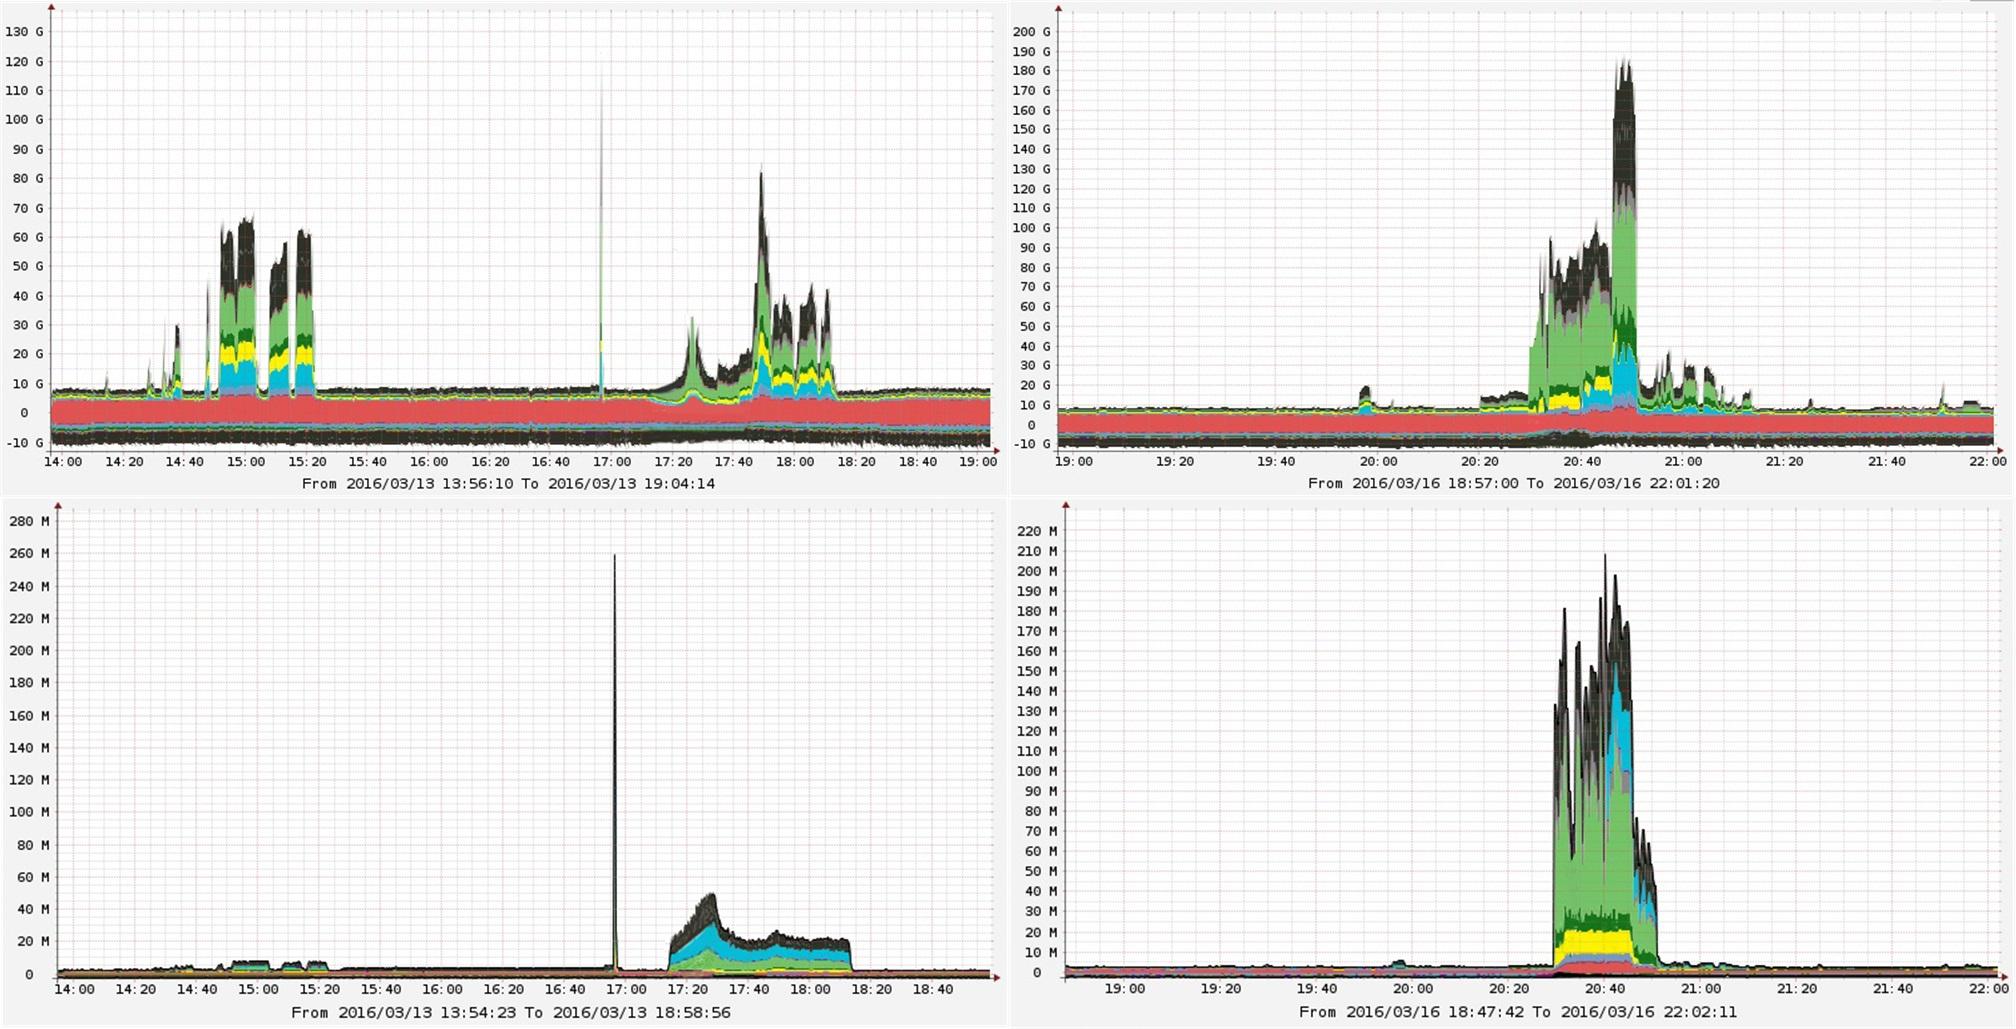 DDoS-GUARD: остановлена рекордно мощная ddos-атака на российские сети